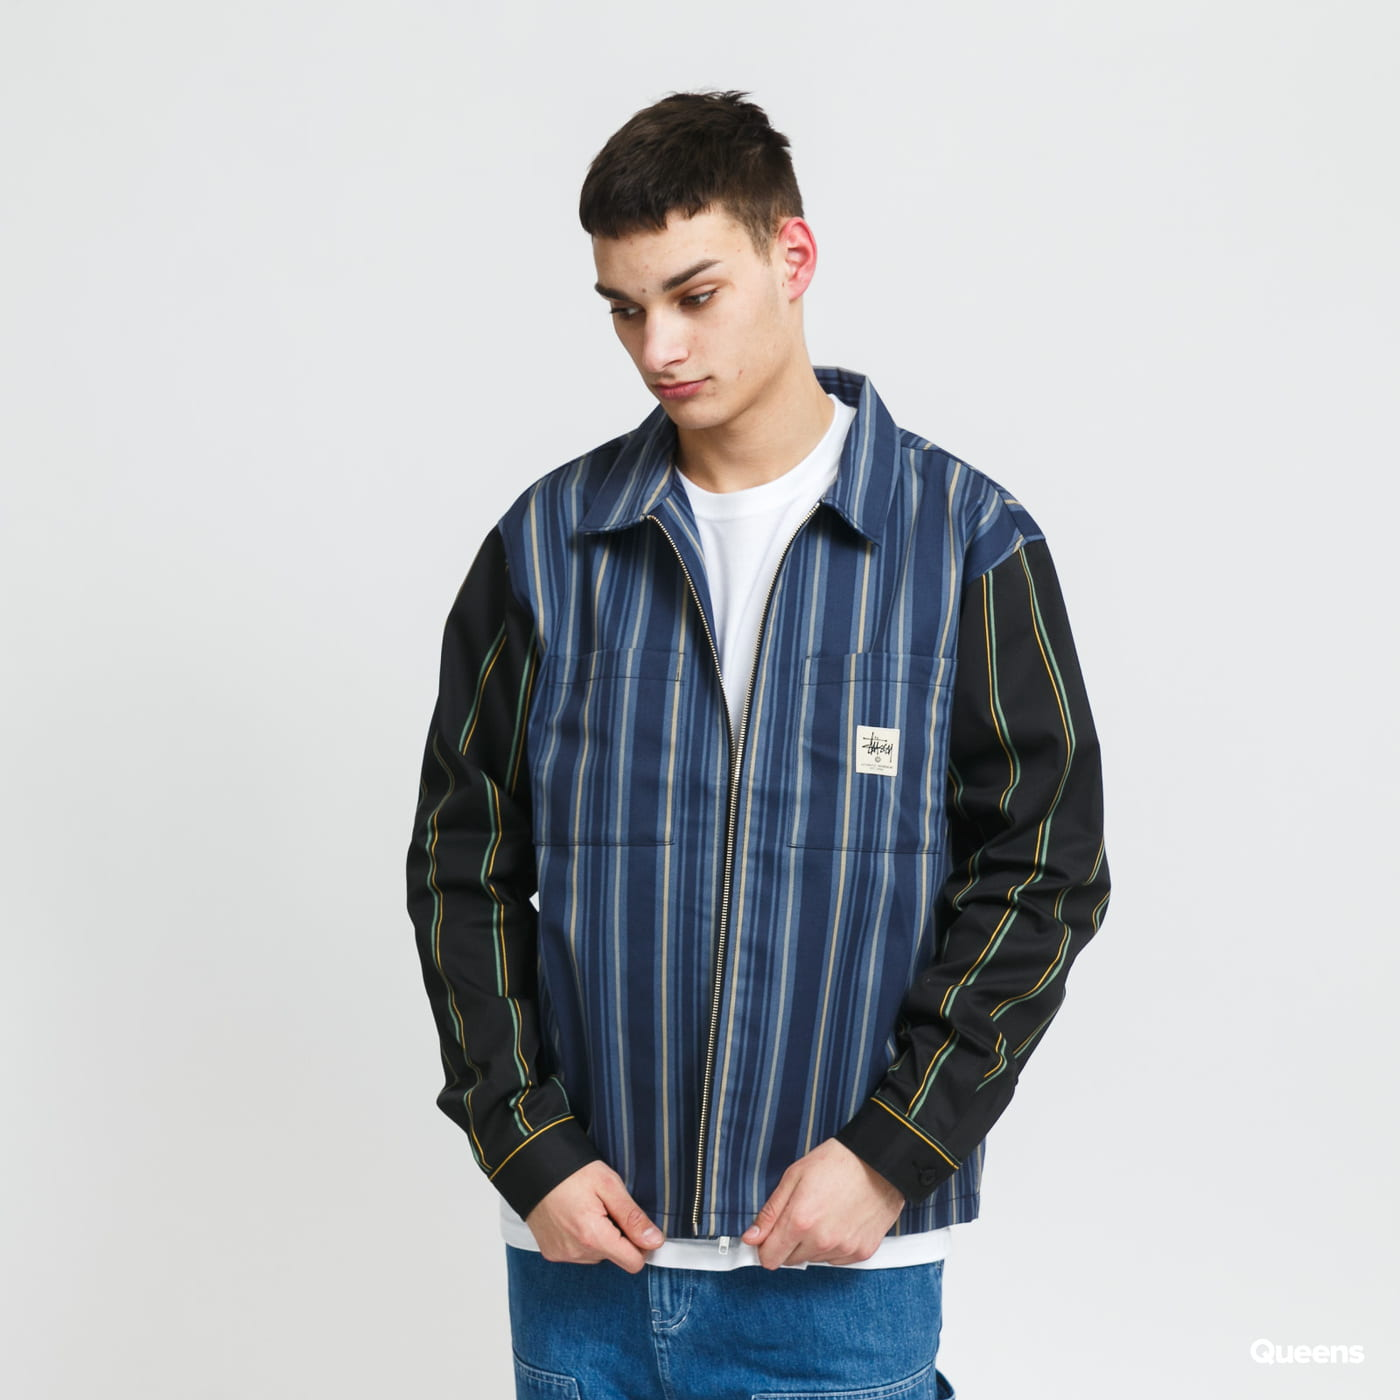 Stüssy Mix Stripe Zip Up Work LS Jacket navy / blue / black